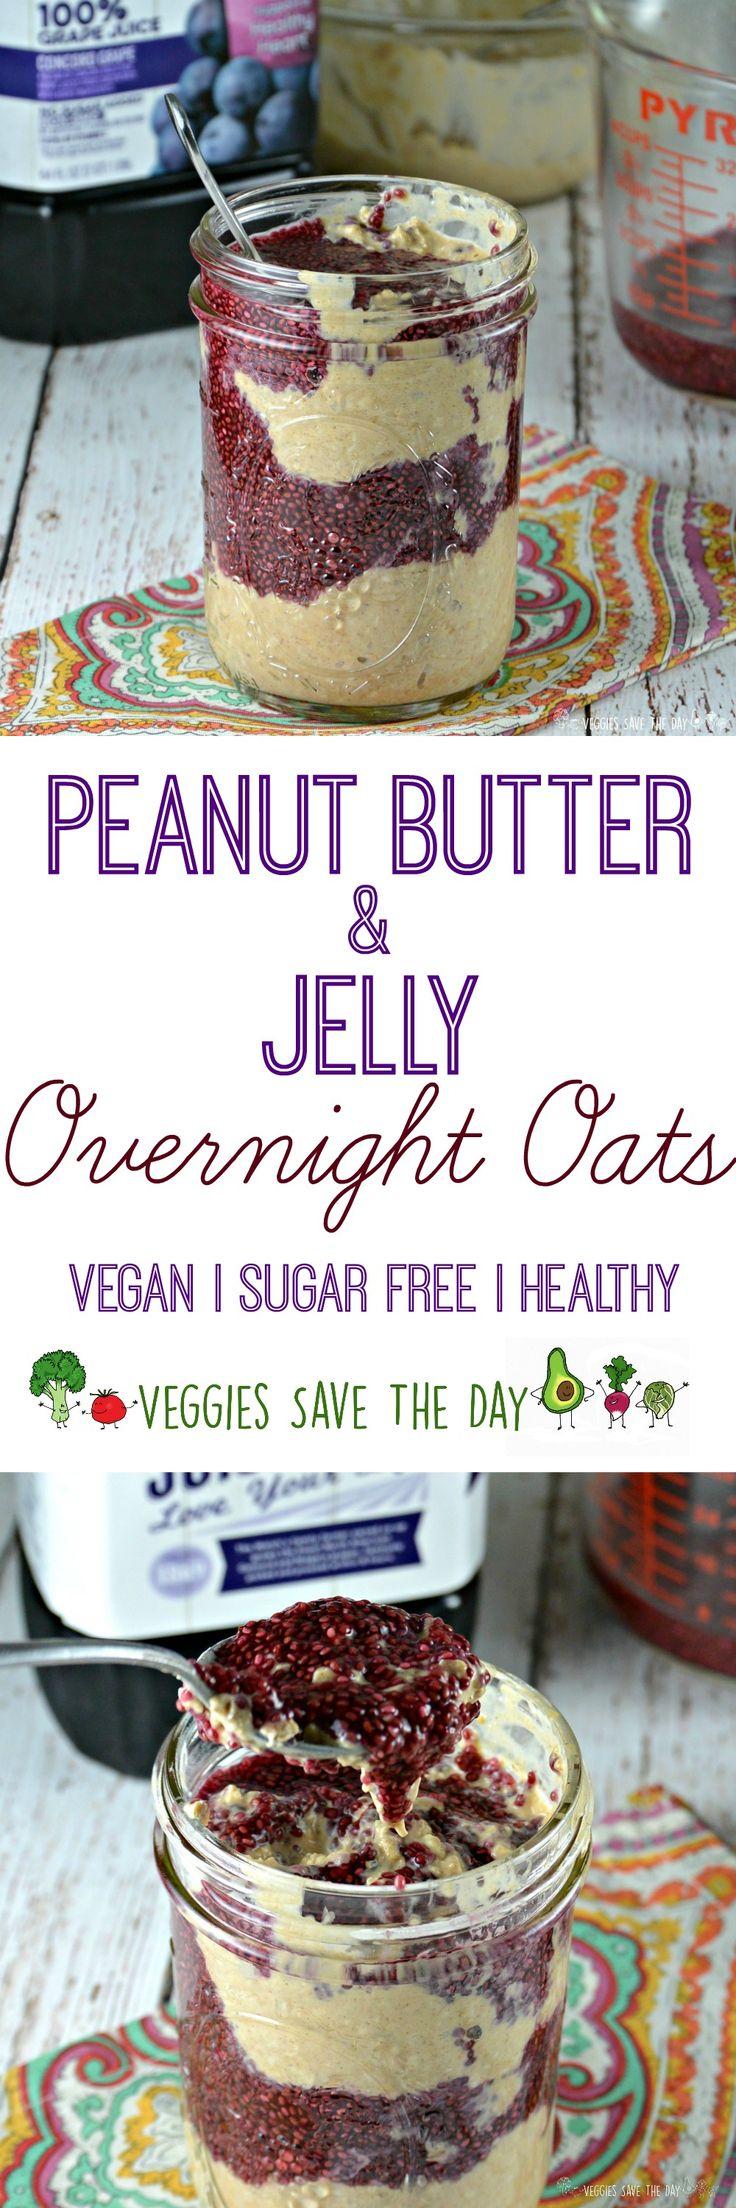 Peanut Butter & Jelly Overnight Oats (COUPON for @Welchs 100% Grape Juice https://ooh.li/b8b09f2 #sponsored #IHeartPurple #AmericanHealthMonth #Welchs